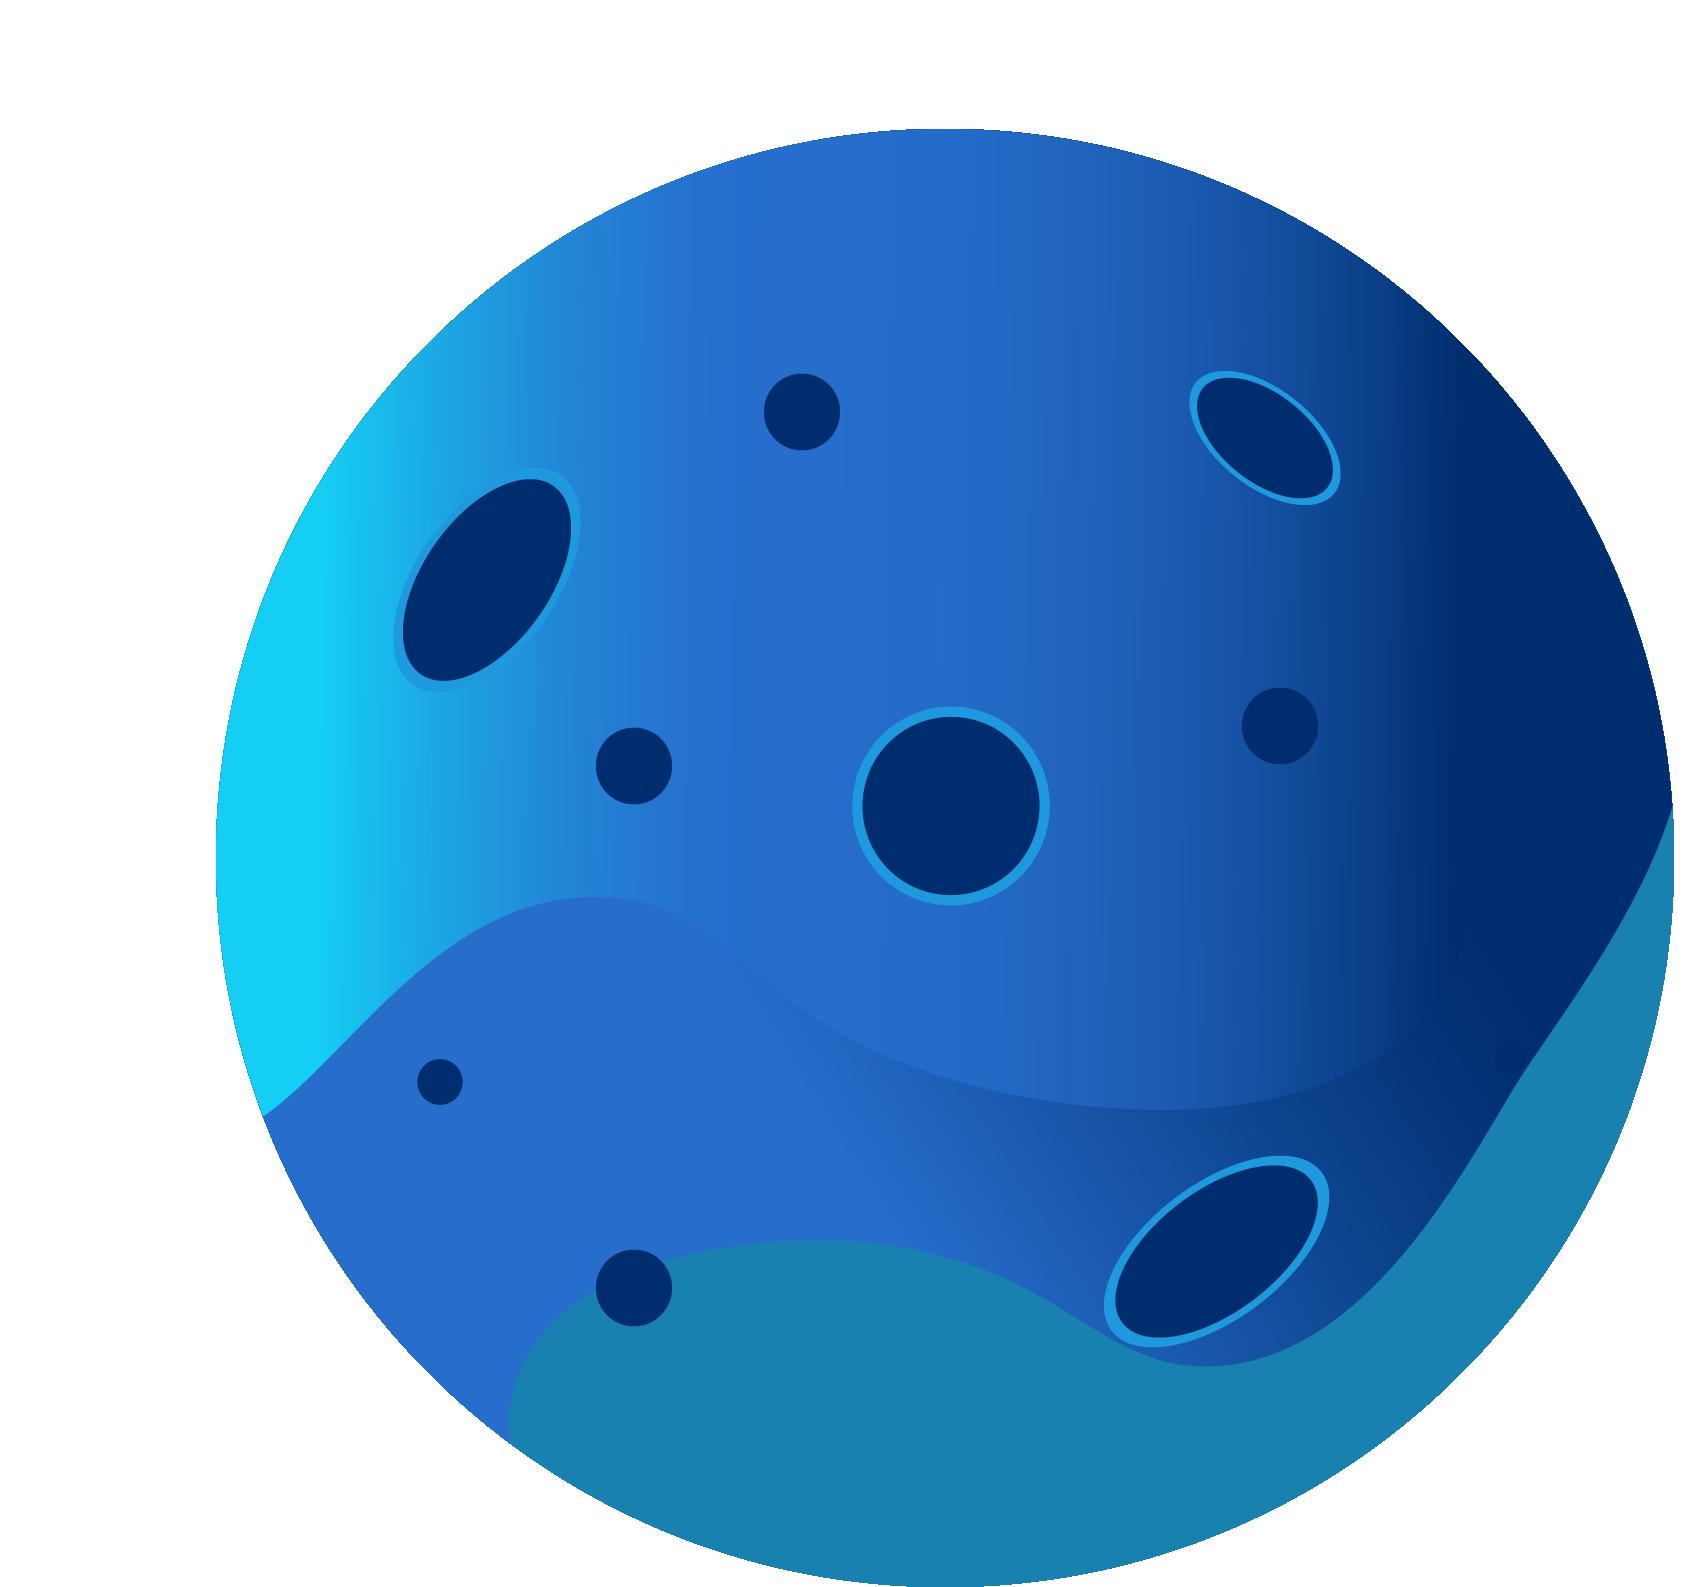 Blue Moon01